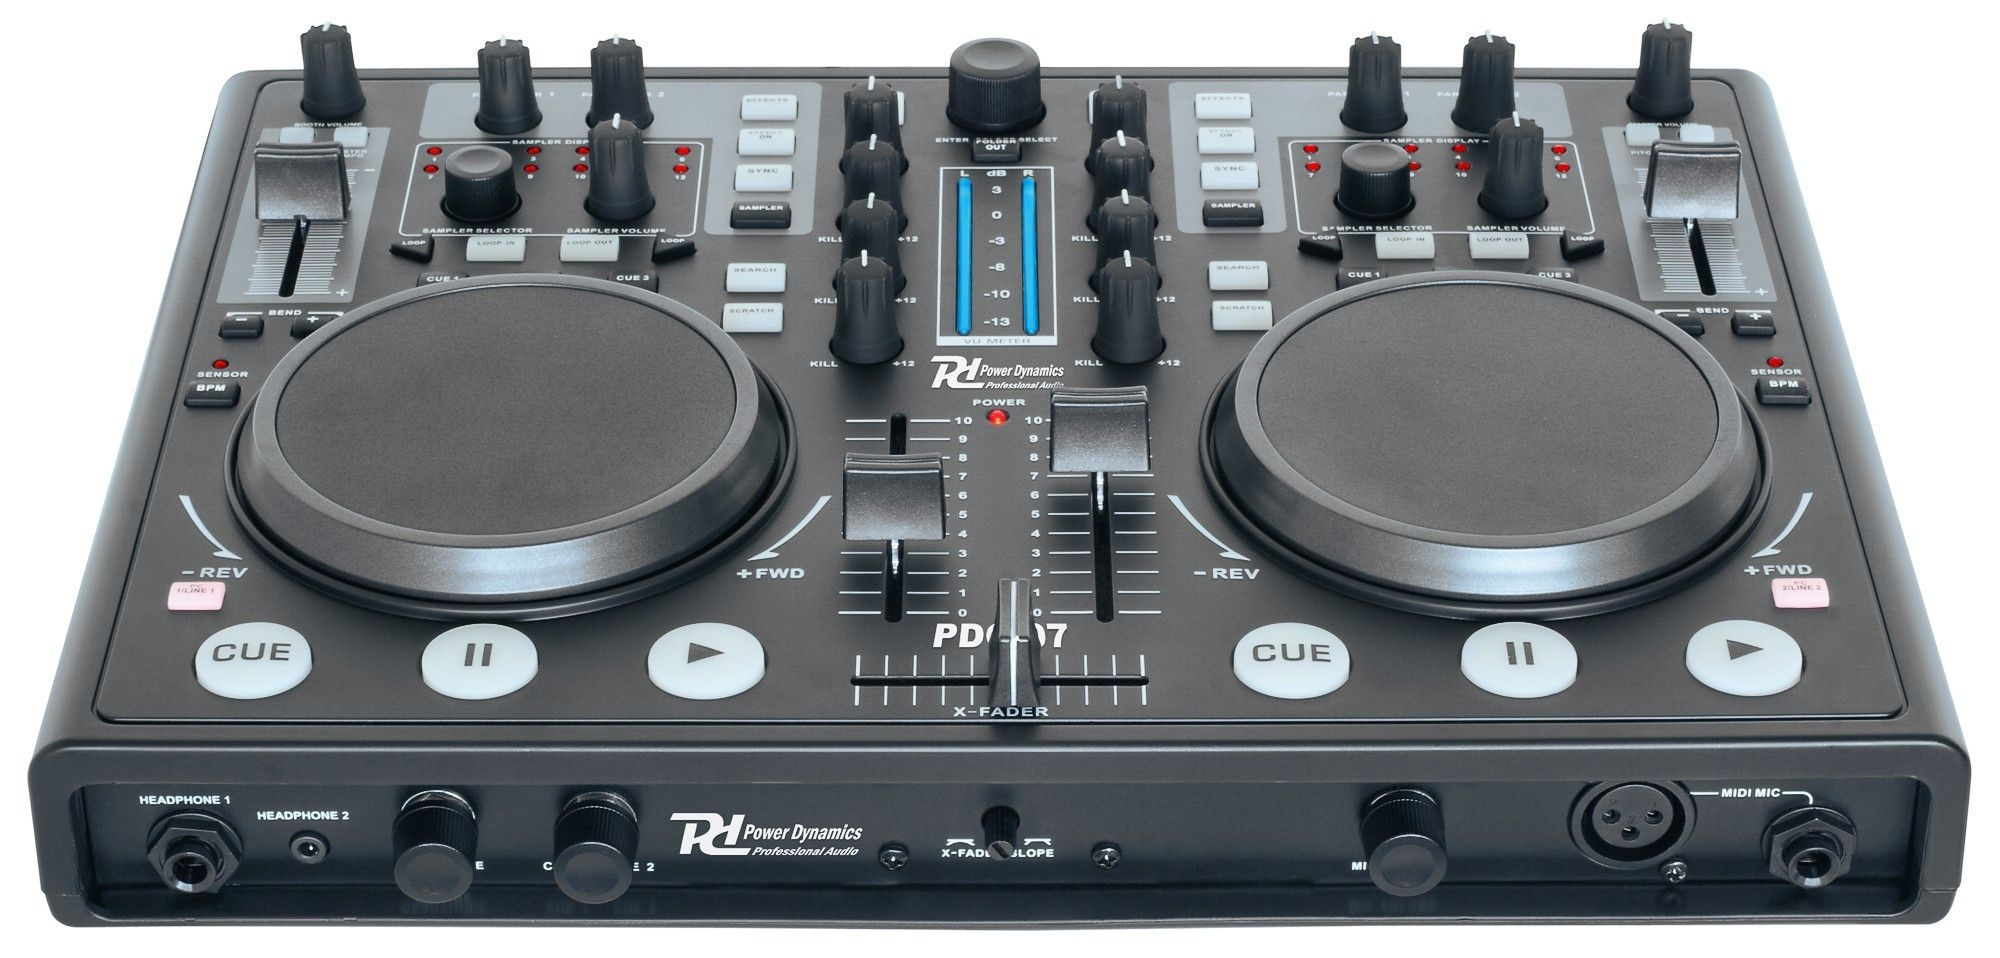 Power Dynamics PDC-07 DJ MIDI controller met geluidskaart & Virtual DJ Software